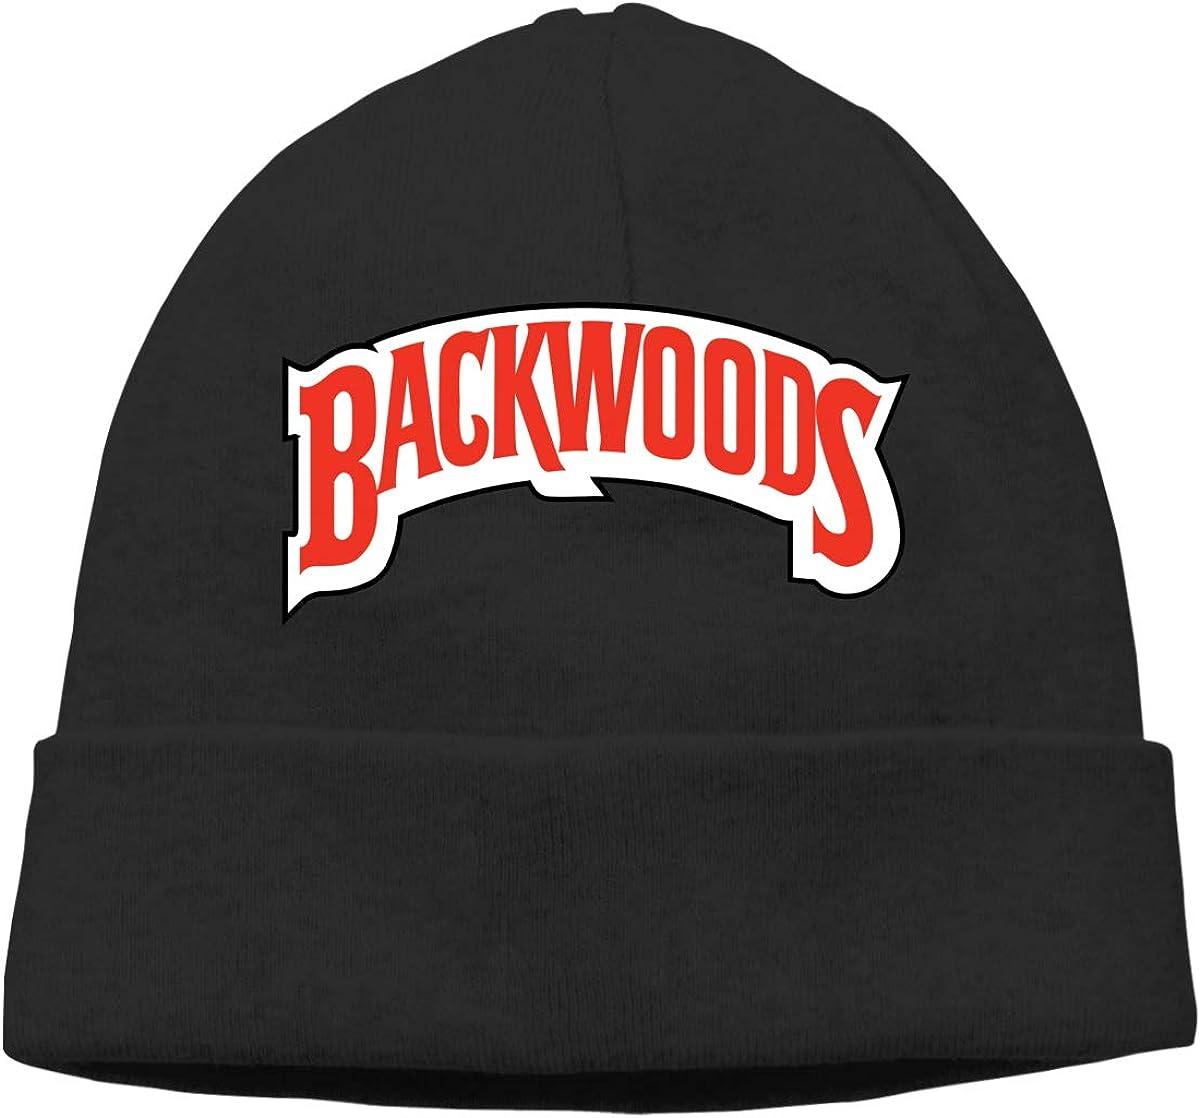 HUCON Backwoods Beanie Unisex Adult Headwear Hat Slouchy Cap